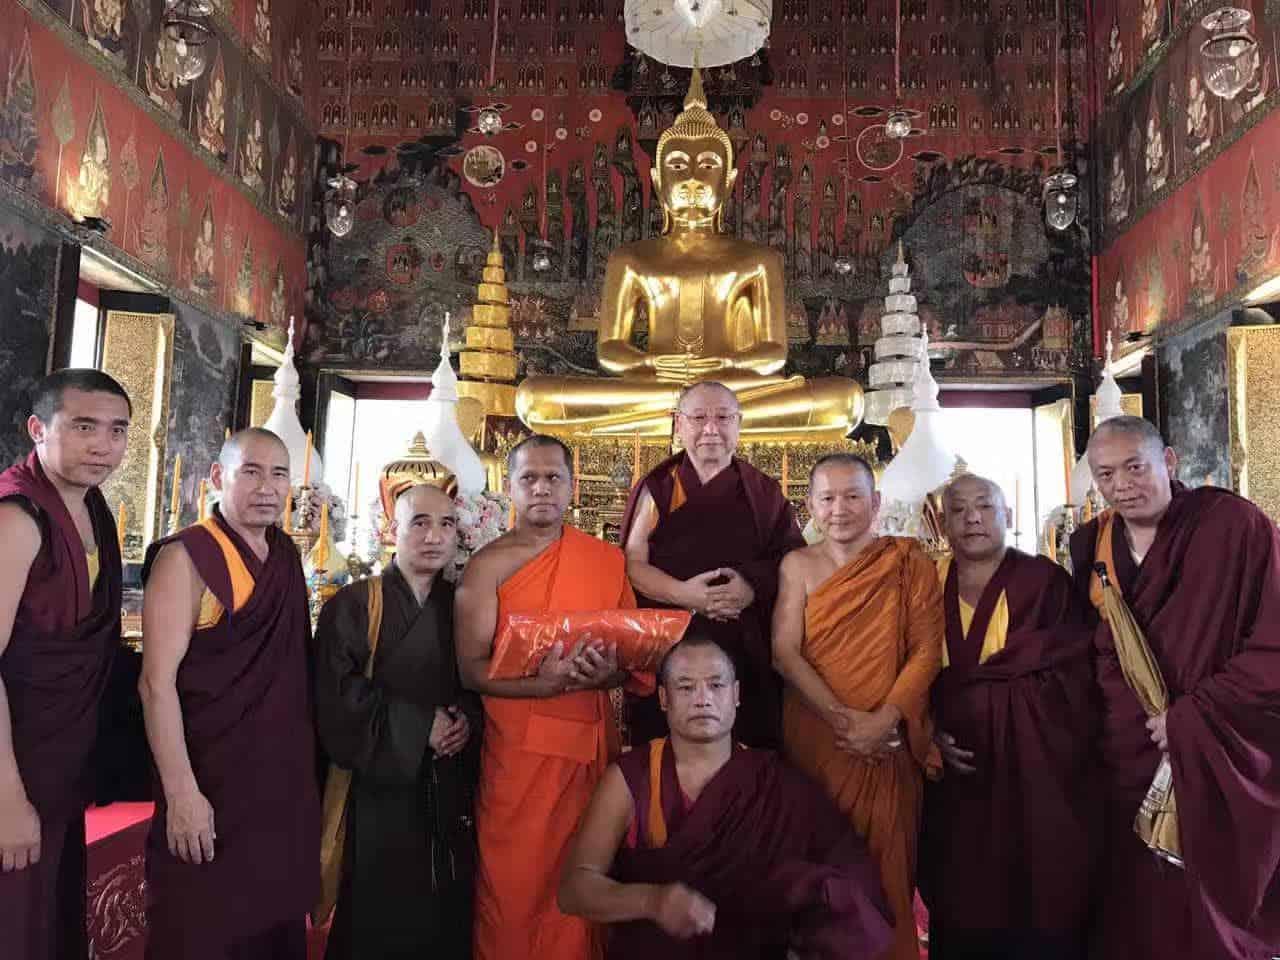 Gosok Rinpoche Thailand 2017 T018 89bc5a7a9b88adc1aa161770d0452f8